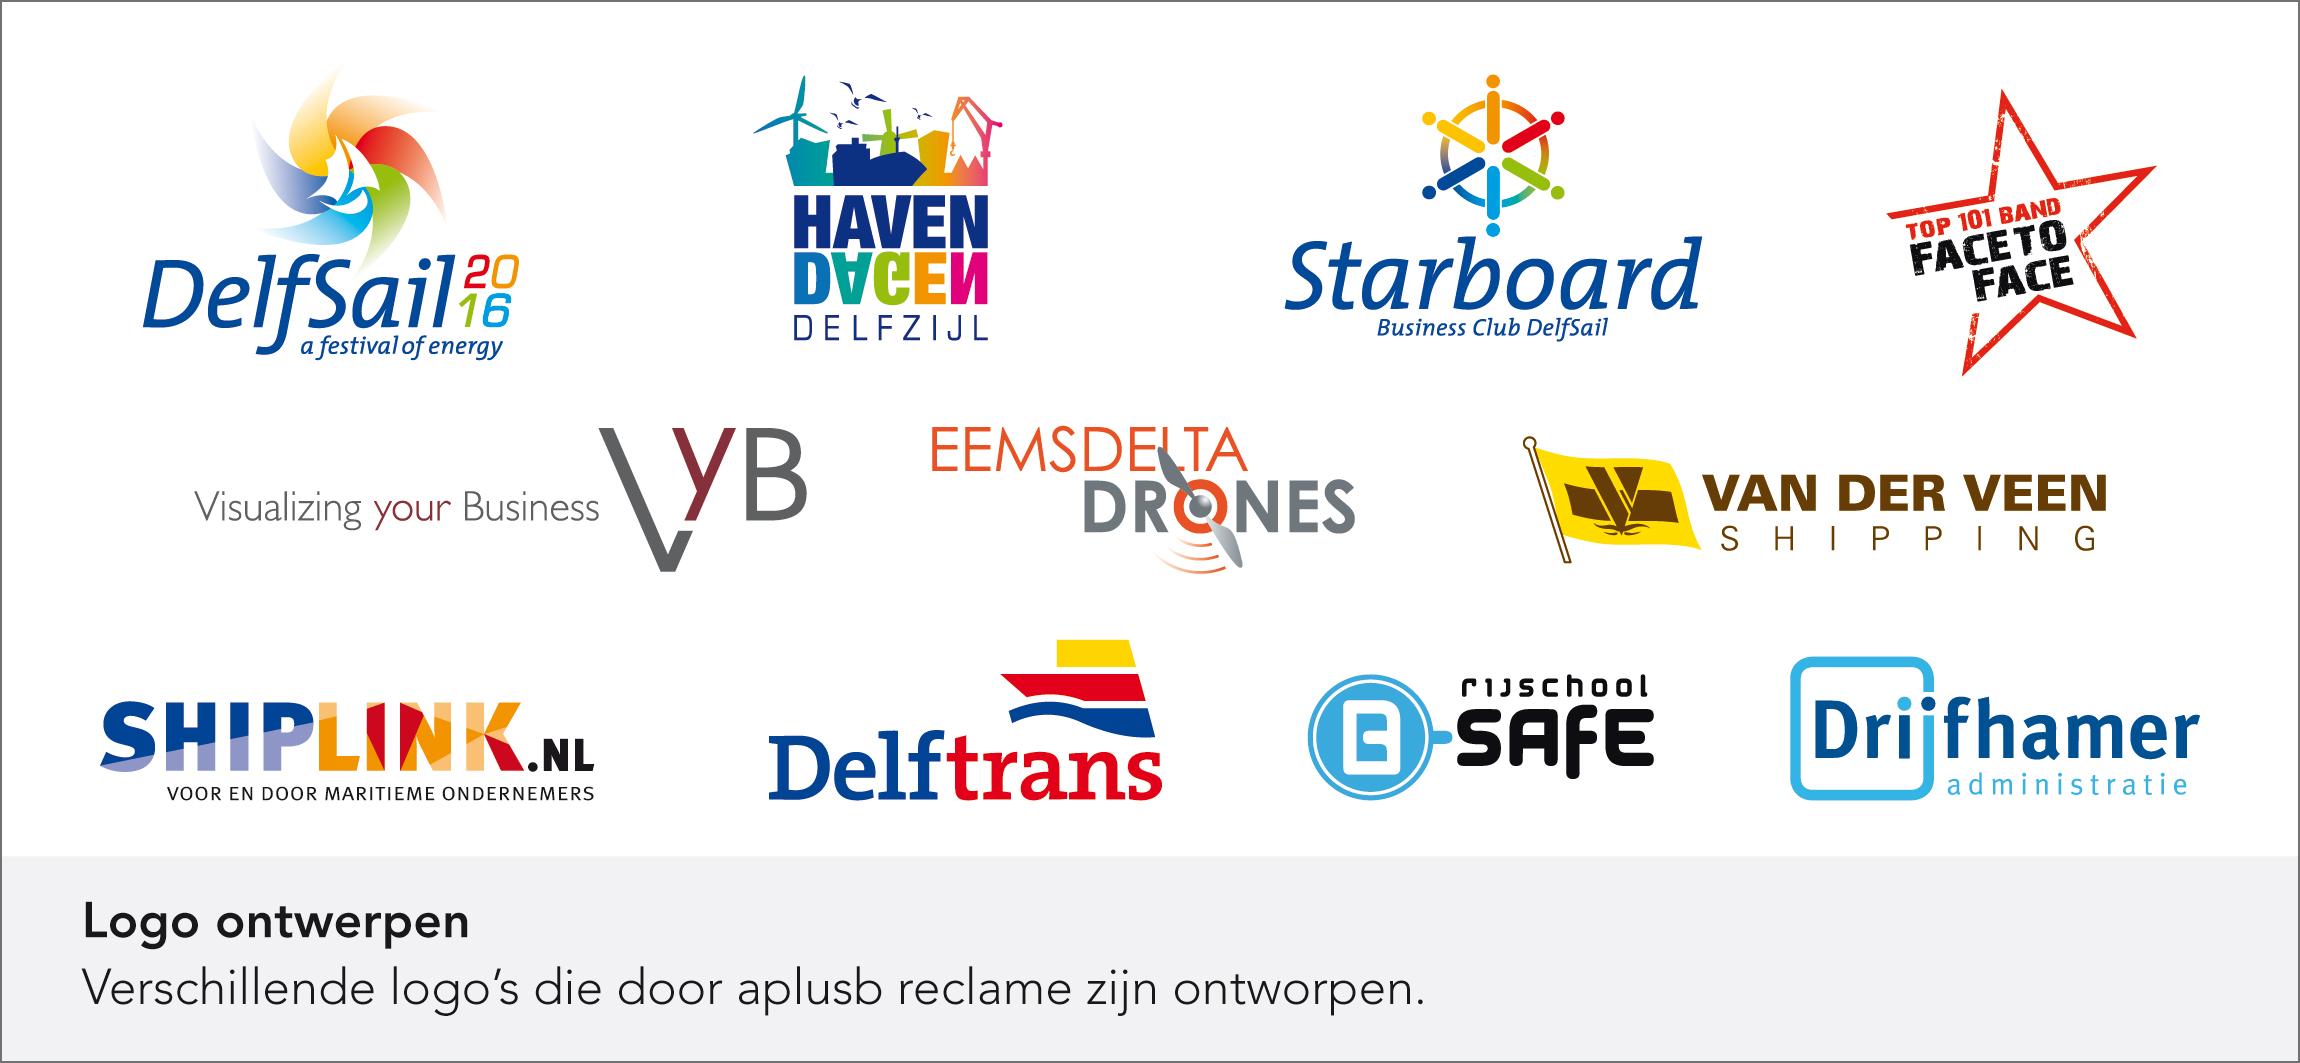 aplusb reclame - Logo ontwerpen